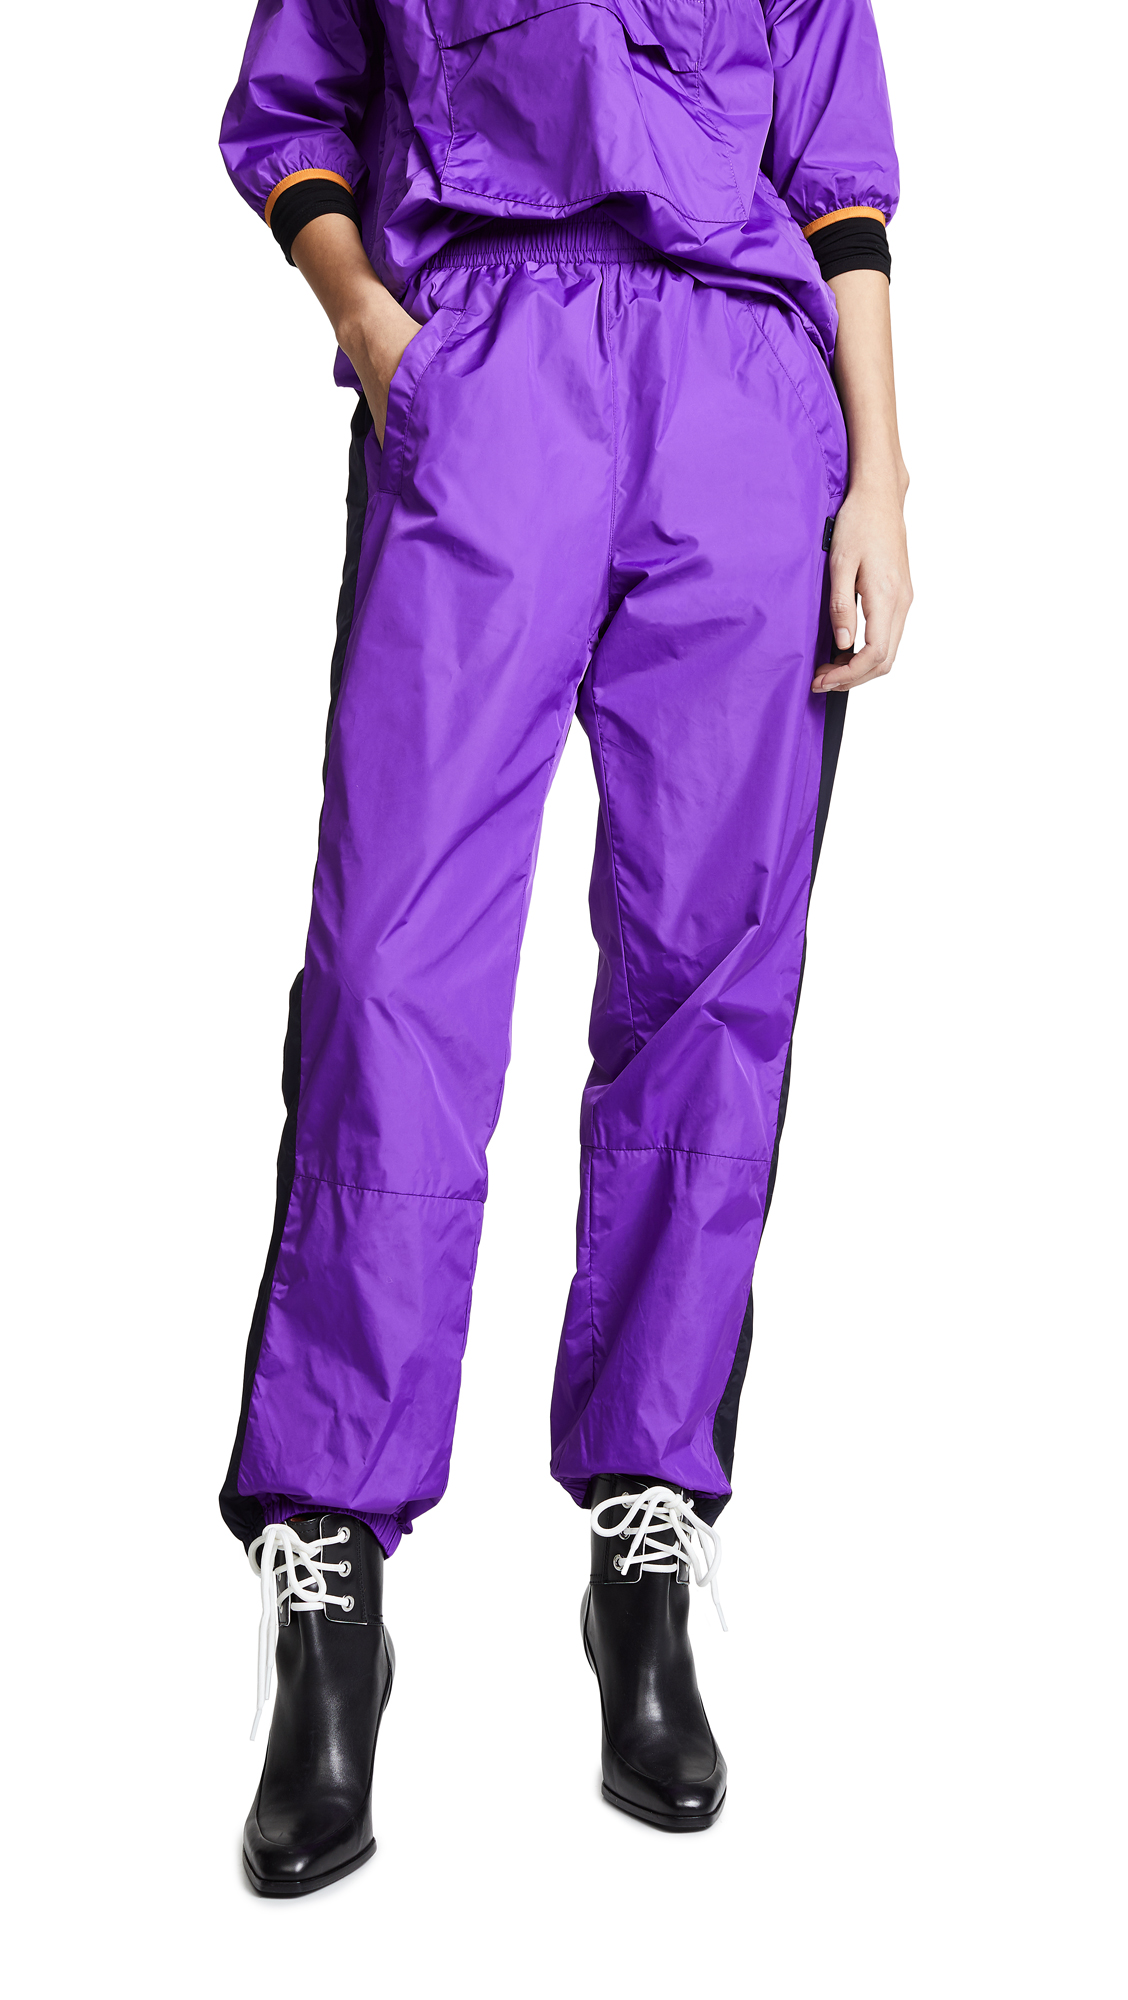 Acne Studios Phoenix Nylon Pants - Violet Purple